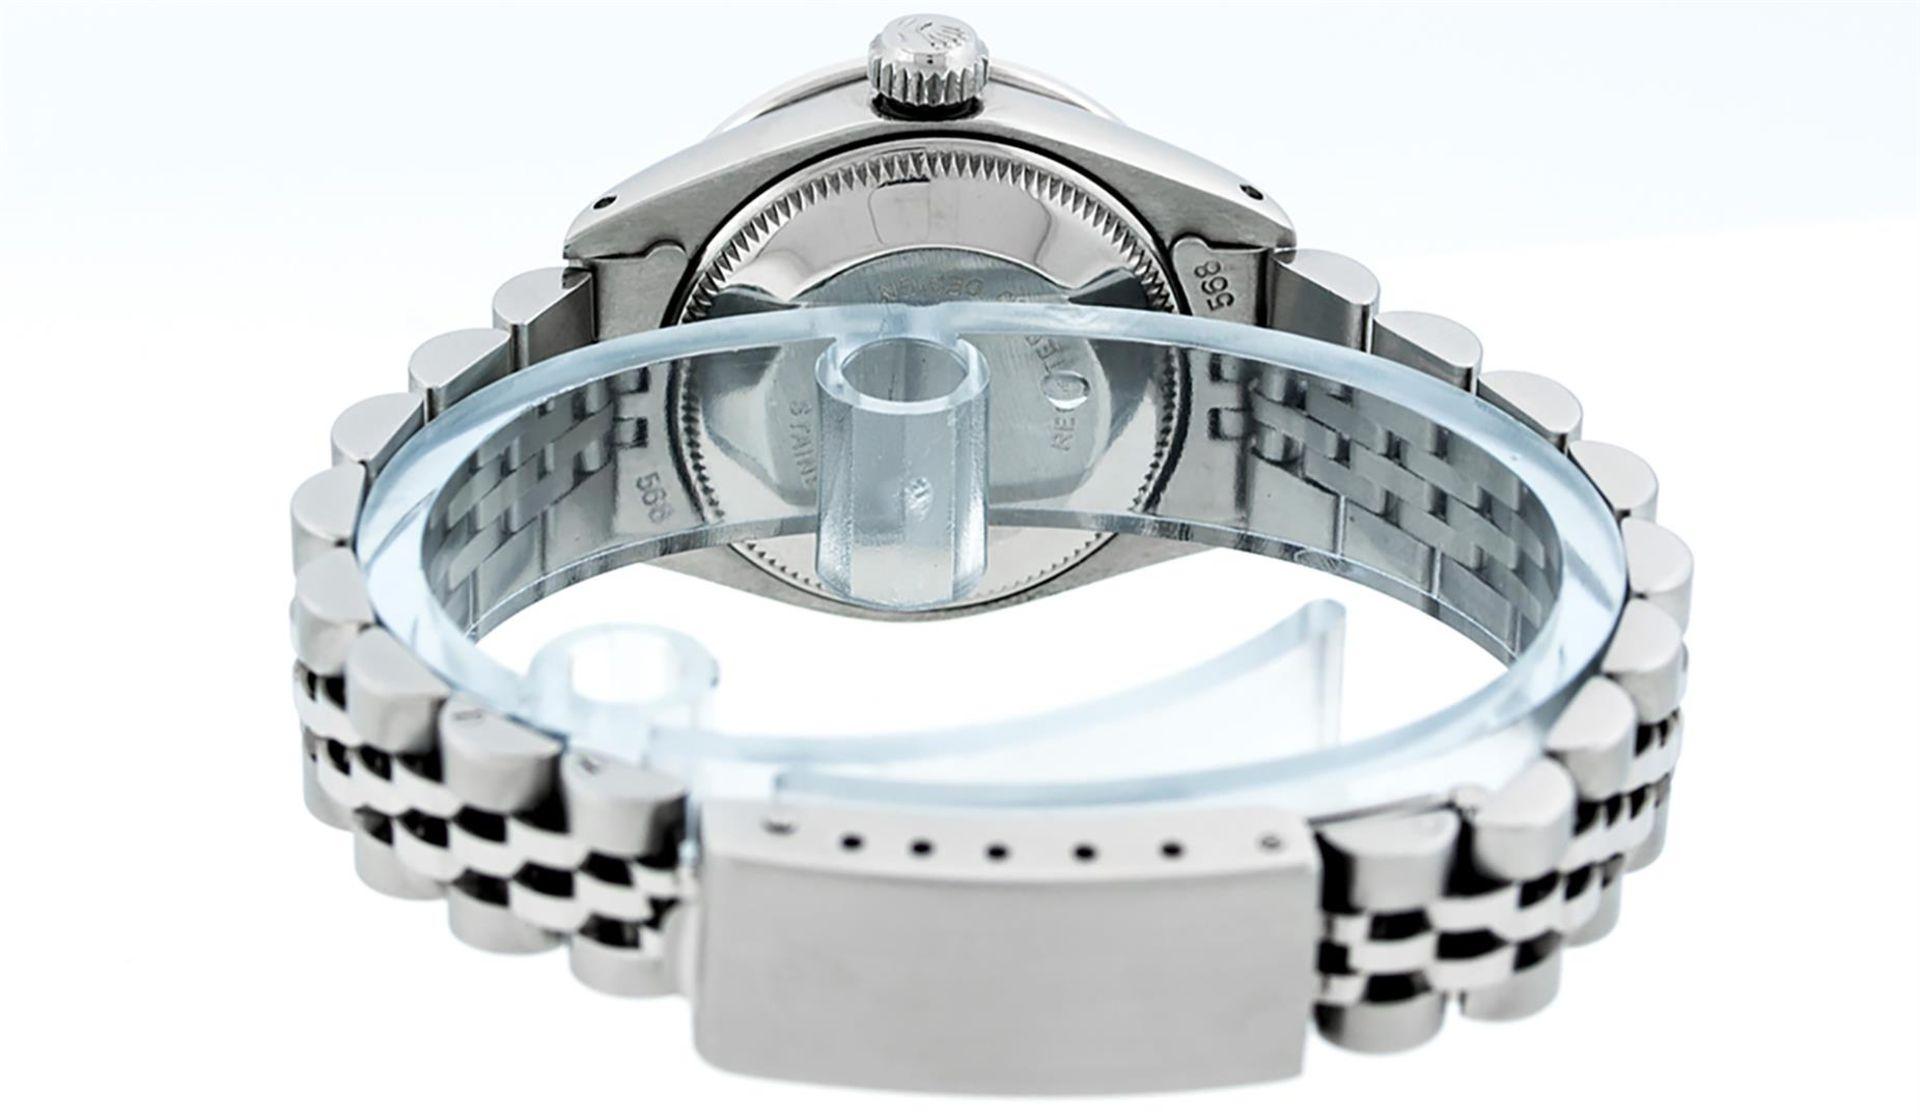 Rolex Ladies Stainless Steel Yellow MOP Emerald & Diamond Datejust Wristwatch - Image 6 of 7